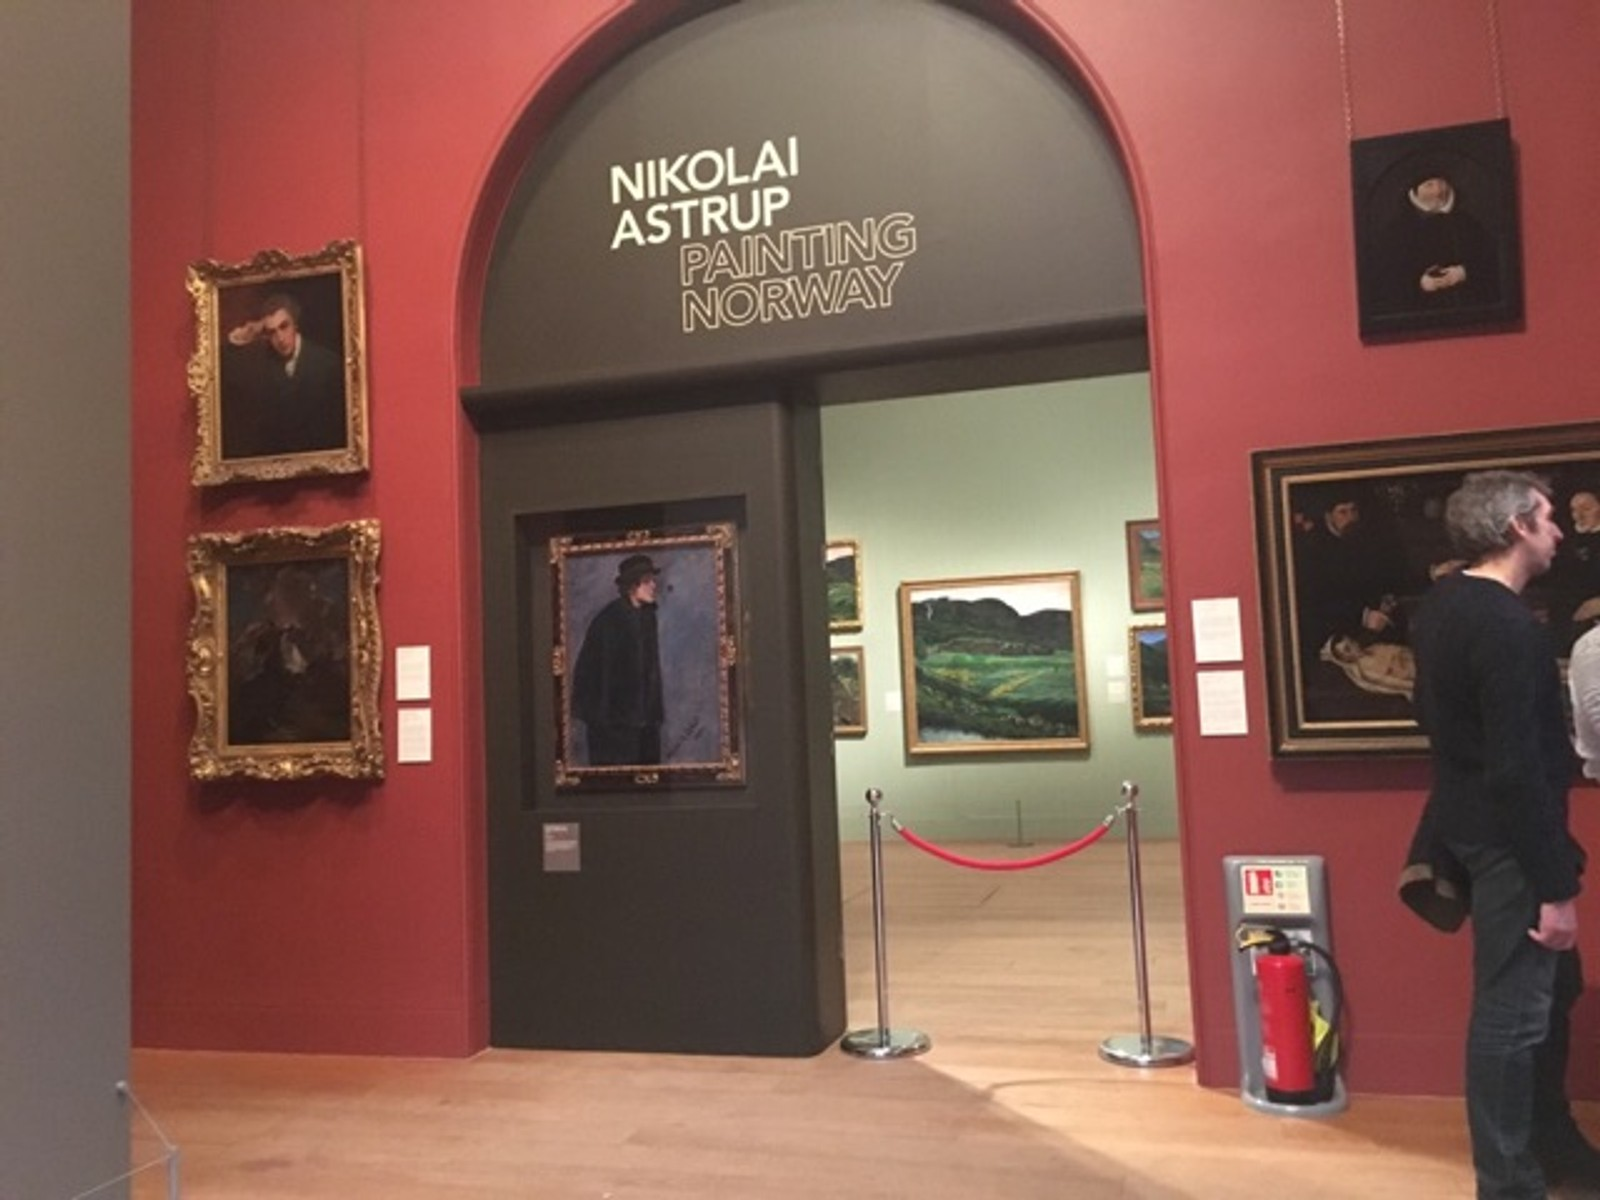 Nikolai Astrup sine måleri dekkjer veggane på Dulwich Picture Gallery i London.